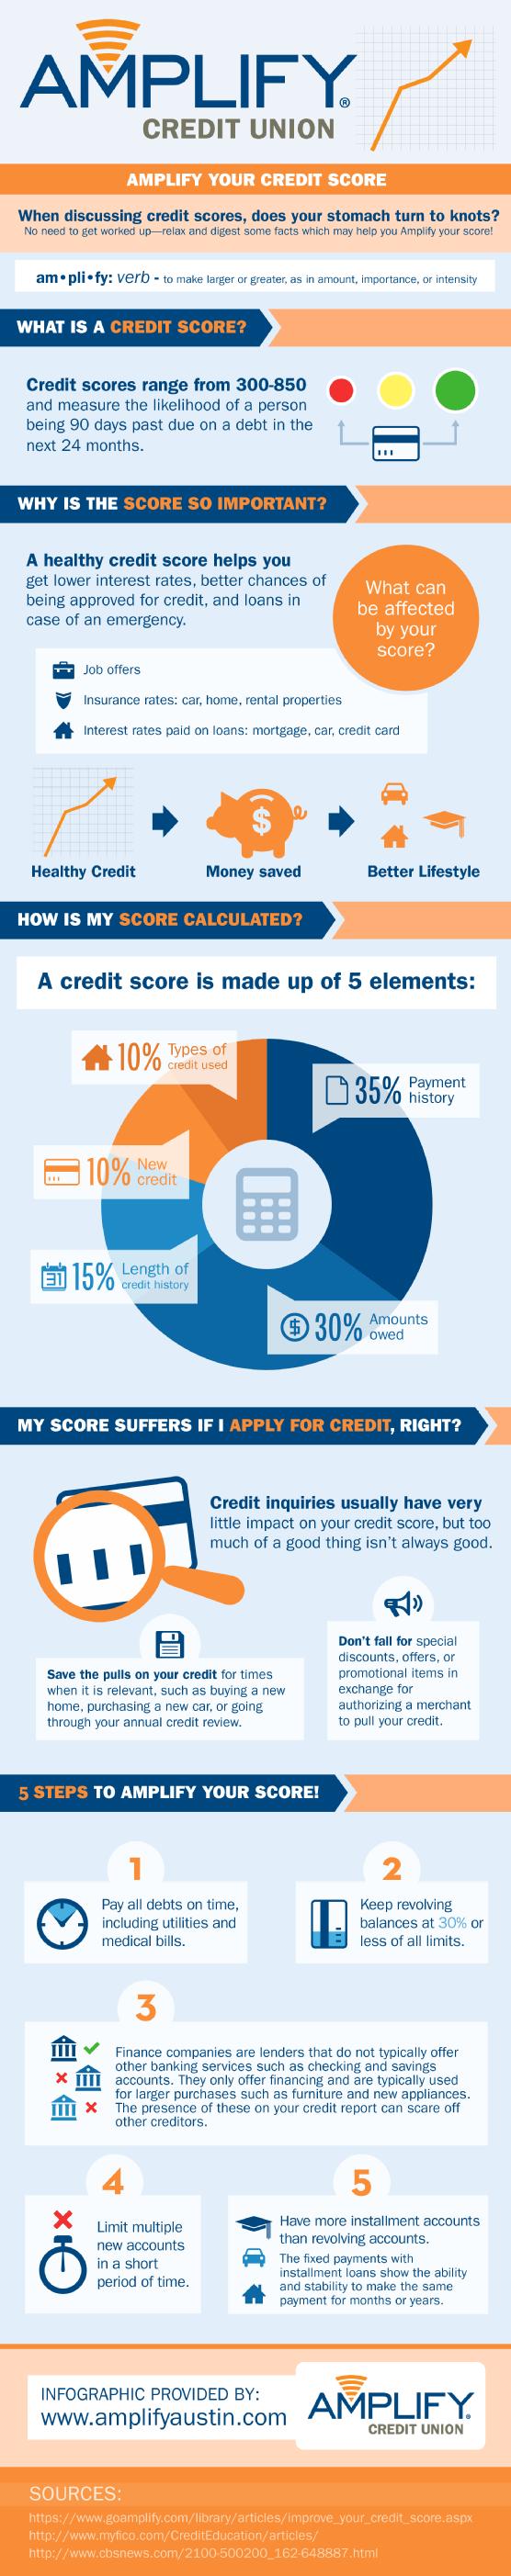 amplify-credit-union_521587191d1cf